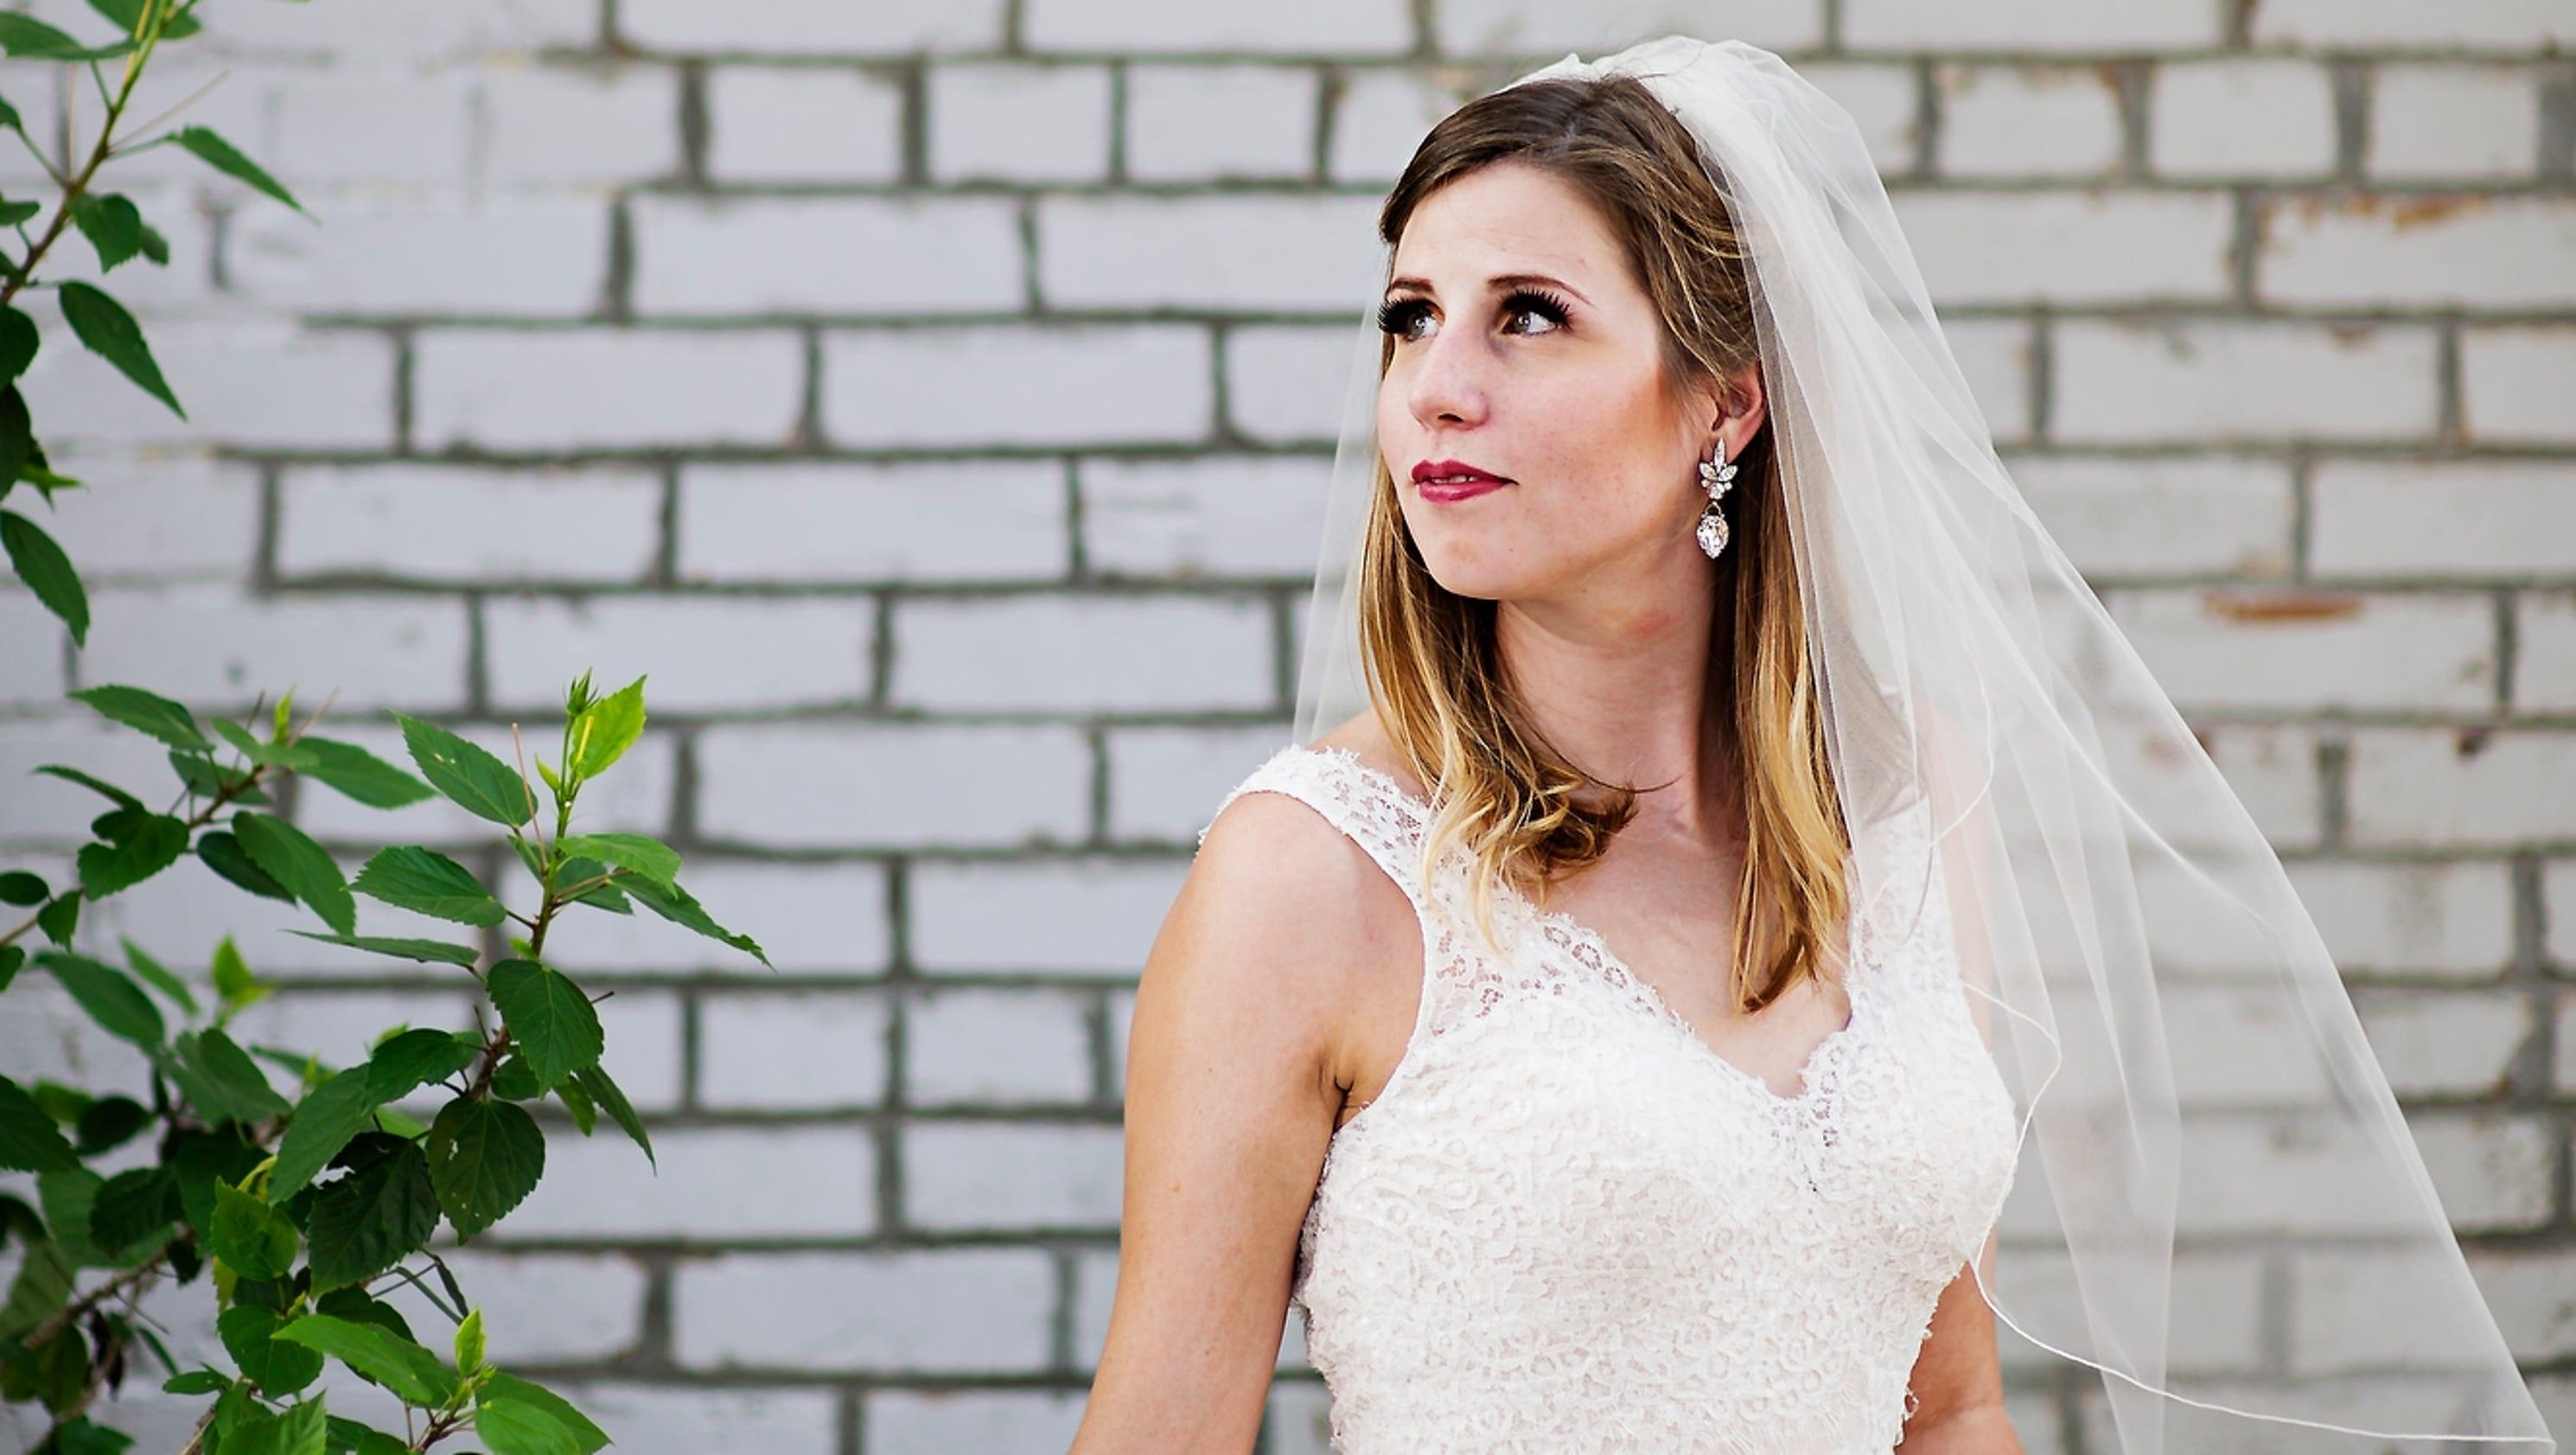 922a6ea0ebd Waukee Community Closet event offers  100 wedding dresses – USA Breaking  News